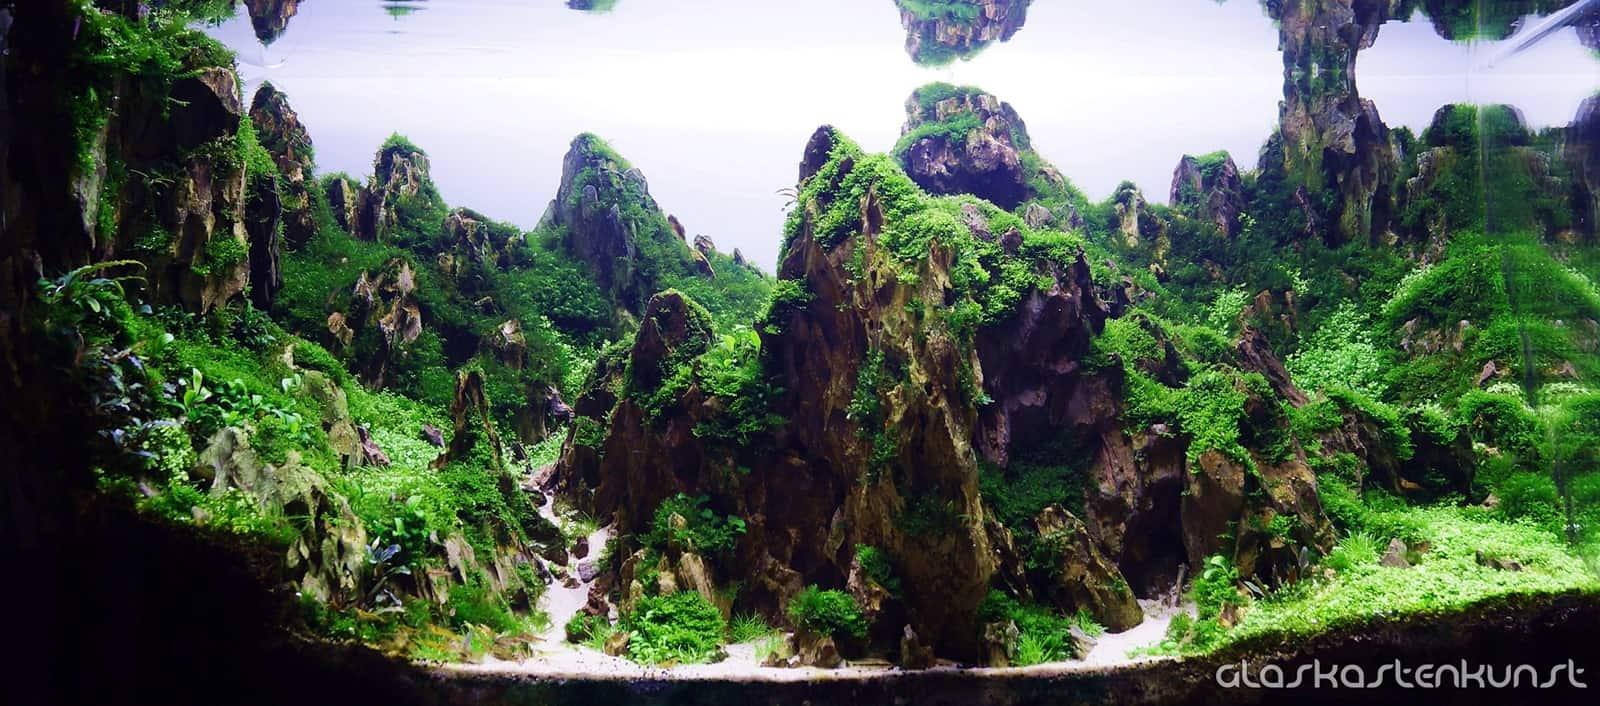 Podcast Episode #152: Die Dry Start Methode (DSM) - Trockenstart des Aquariums (Andy Ruppert) 3